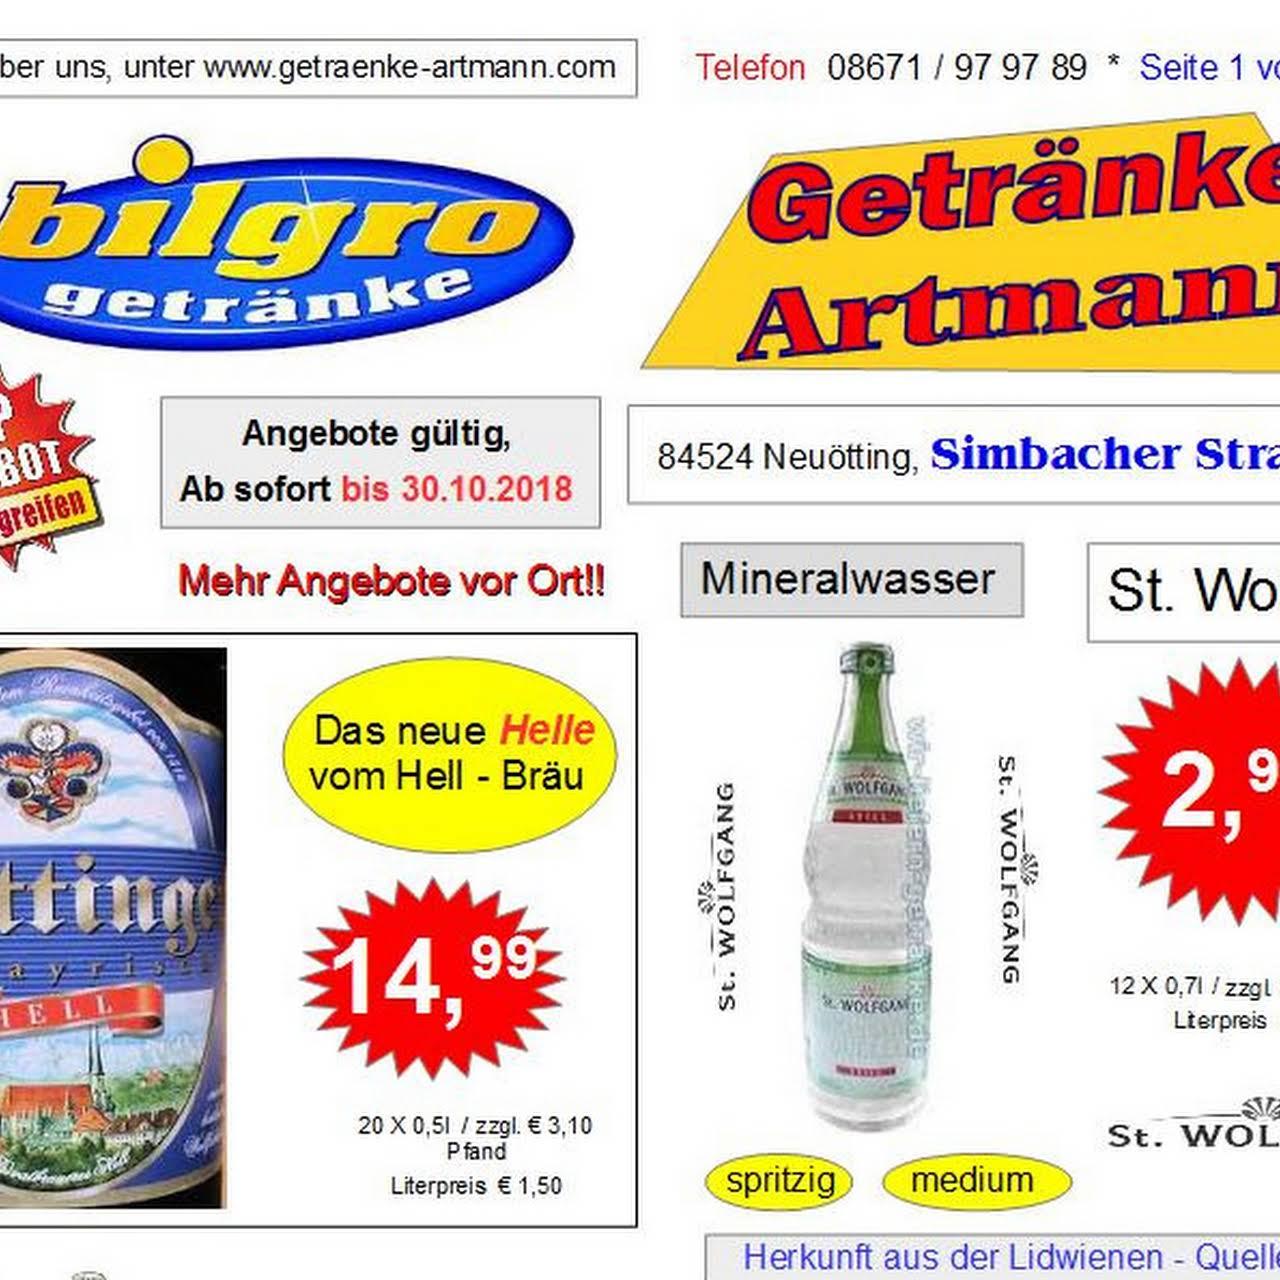 Getränke Artmann - Getränkemarkt Artmann in Neuötting